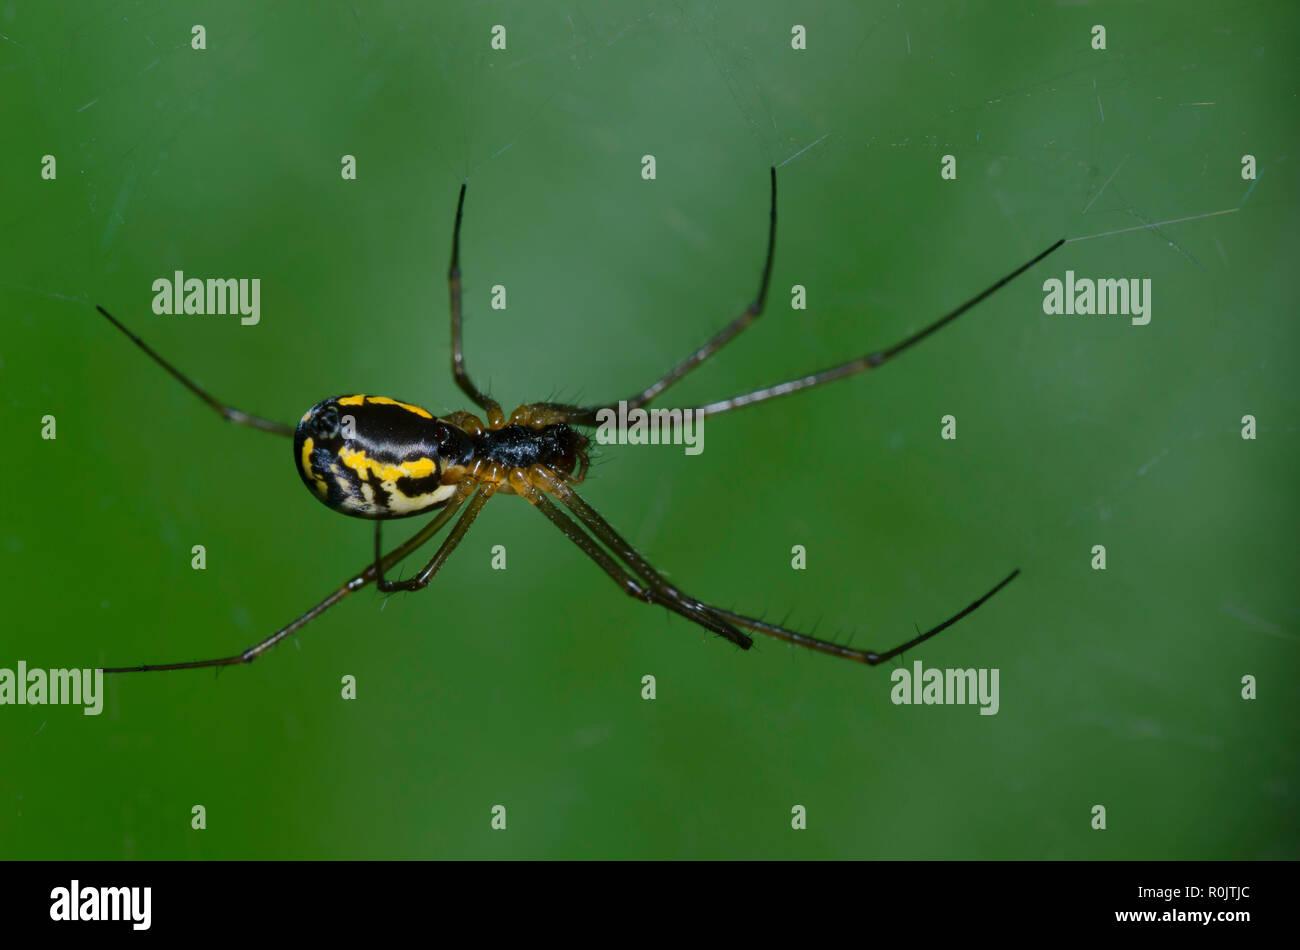 Sheetweb Spider, Subfamily Linyphiinae Stock Photo